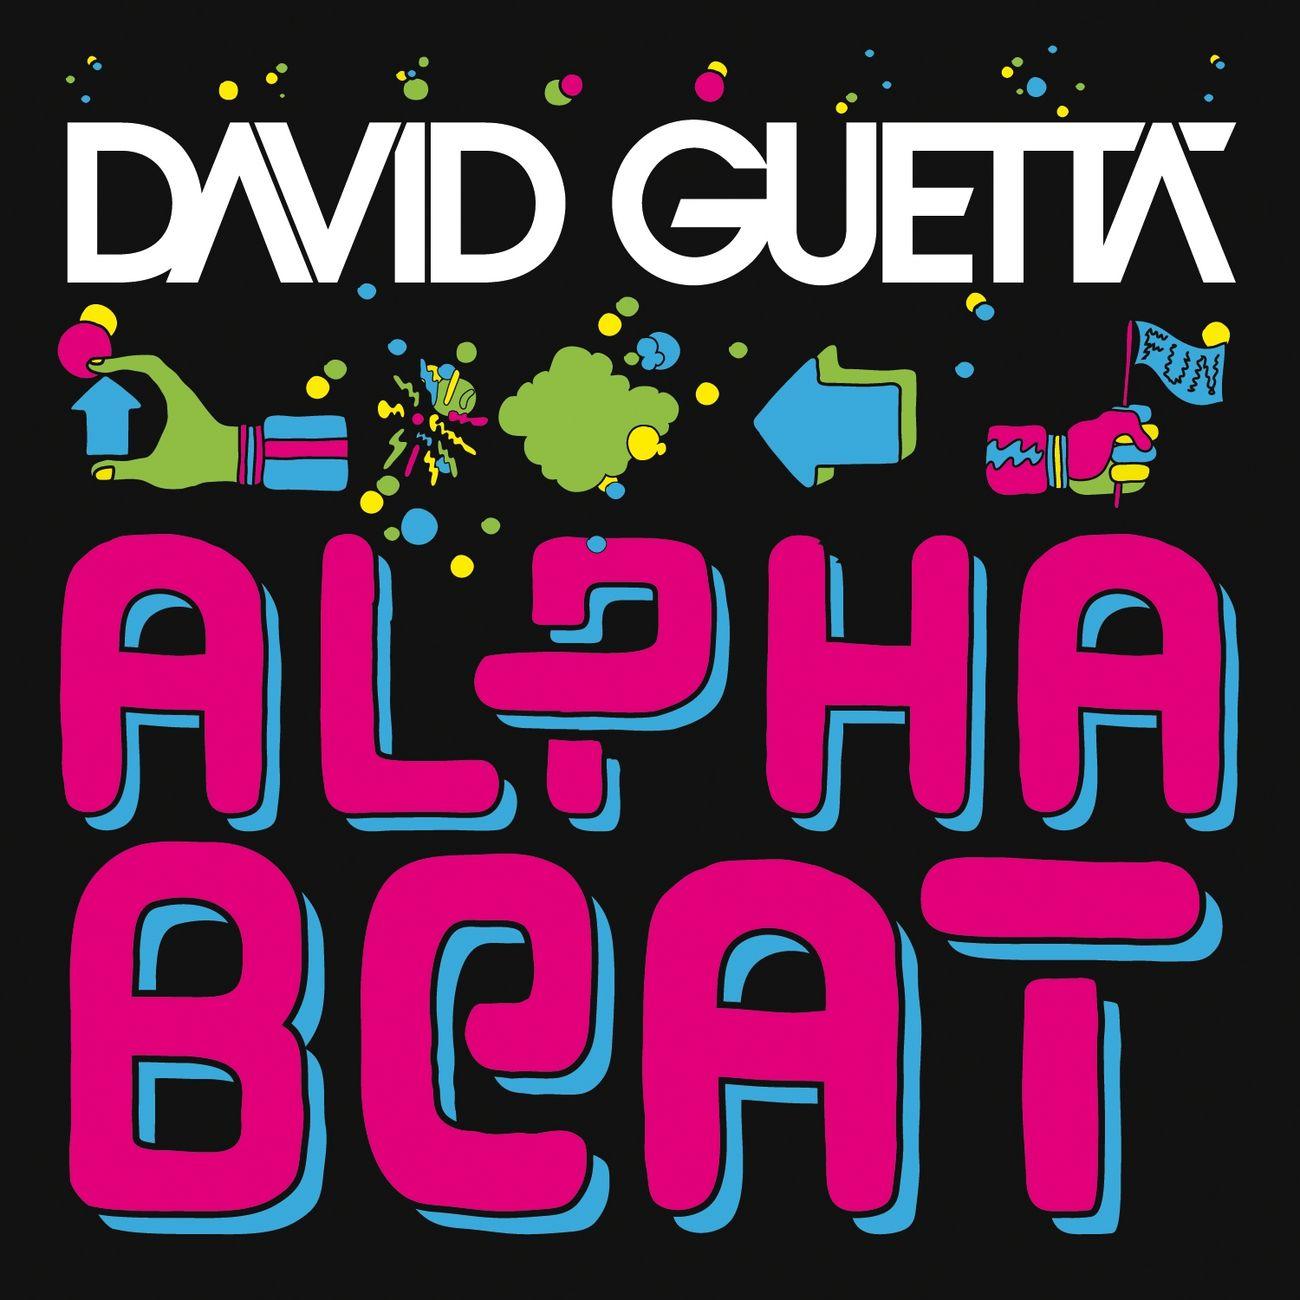 The alphabeat